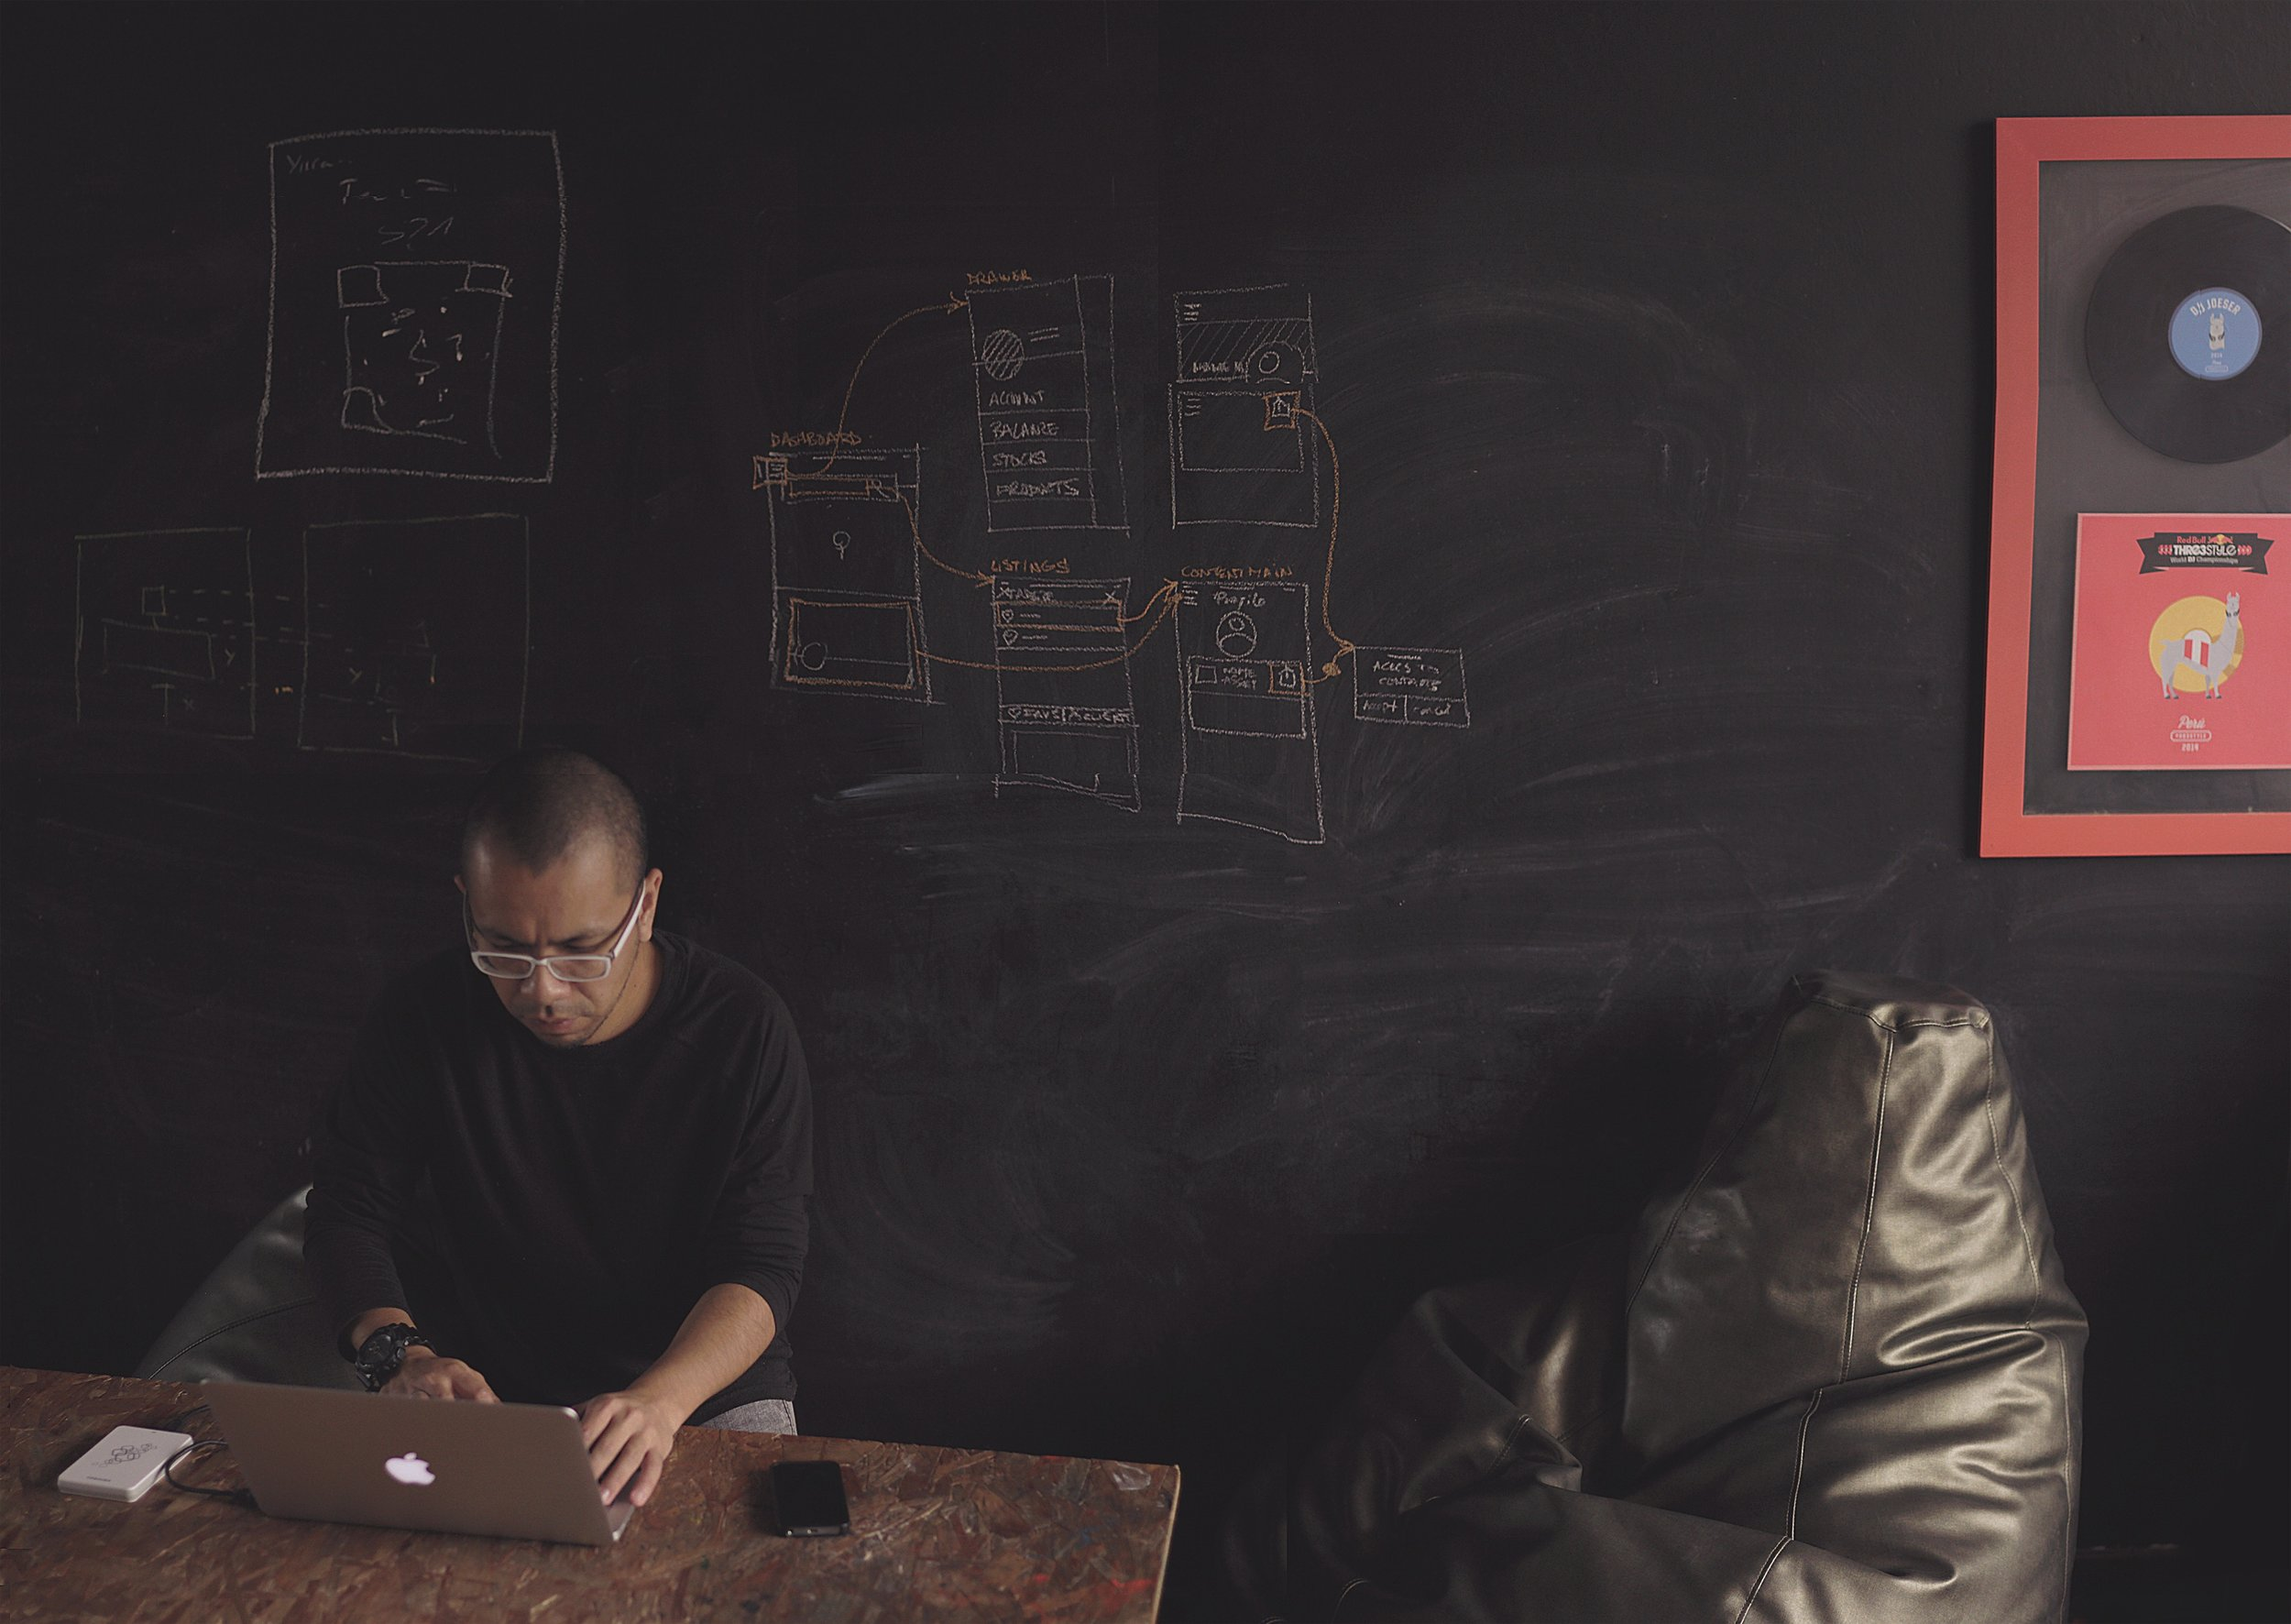 Design Thinking Designer Working on Project